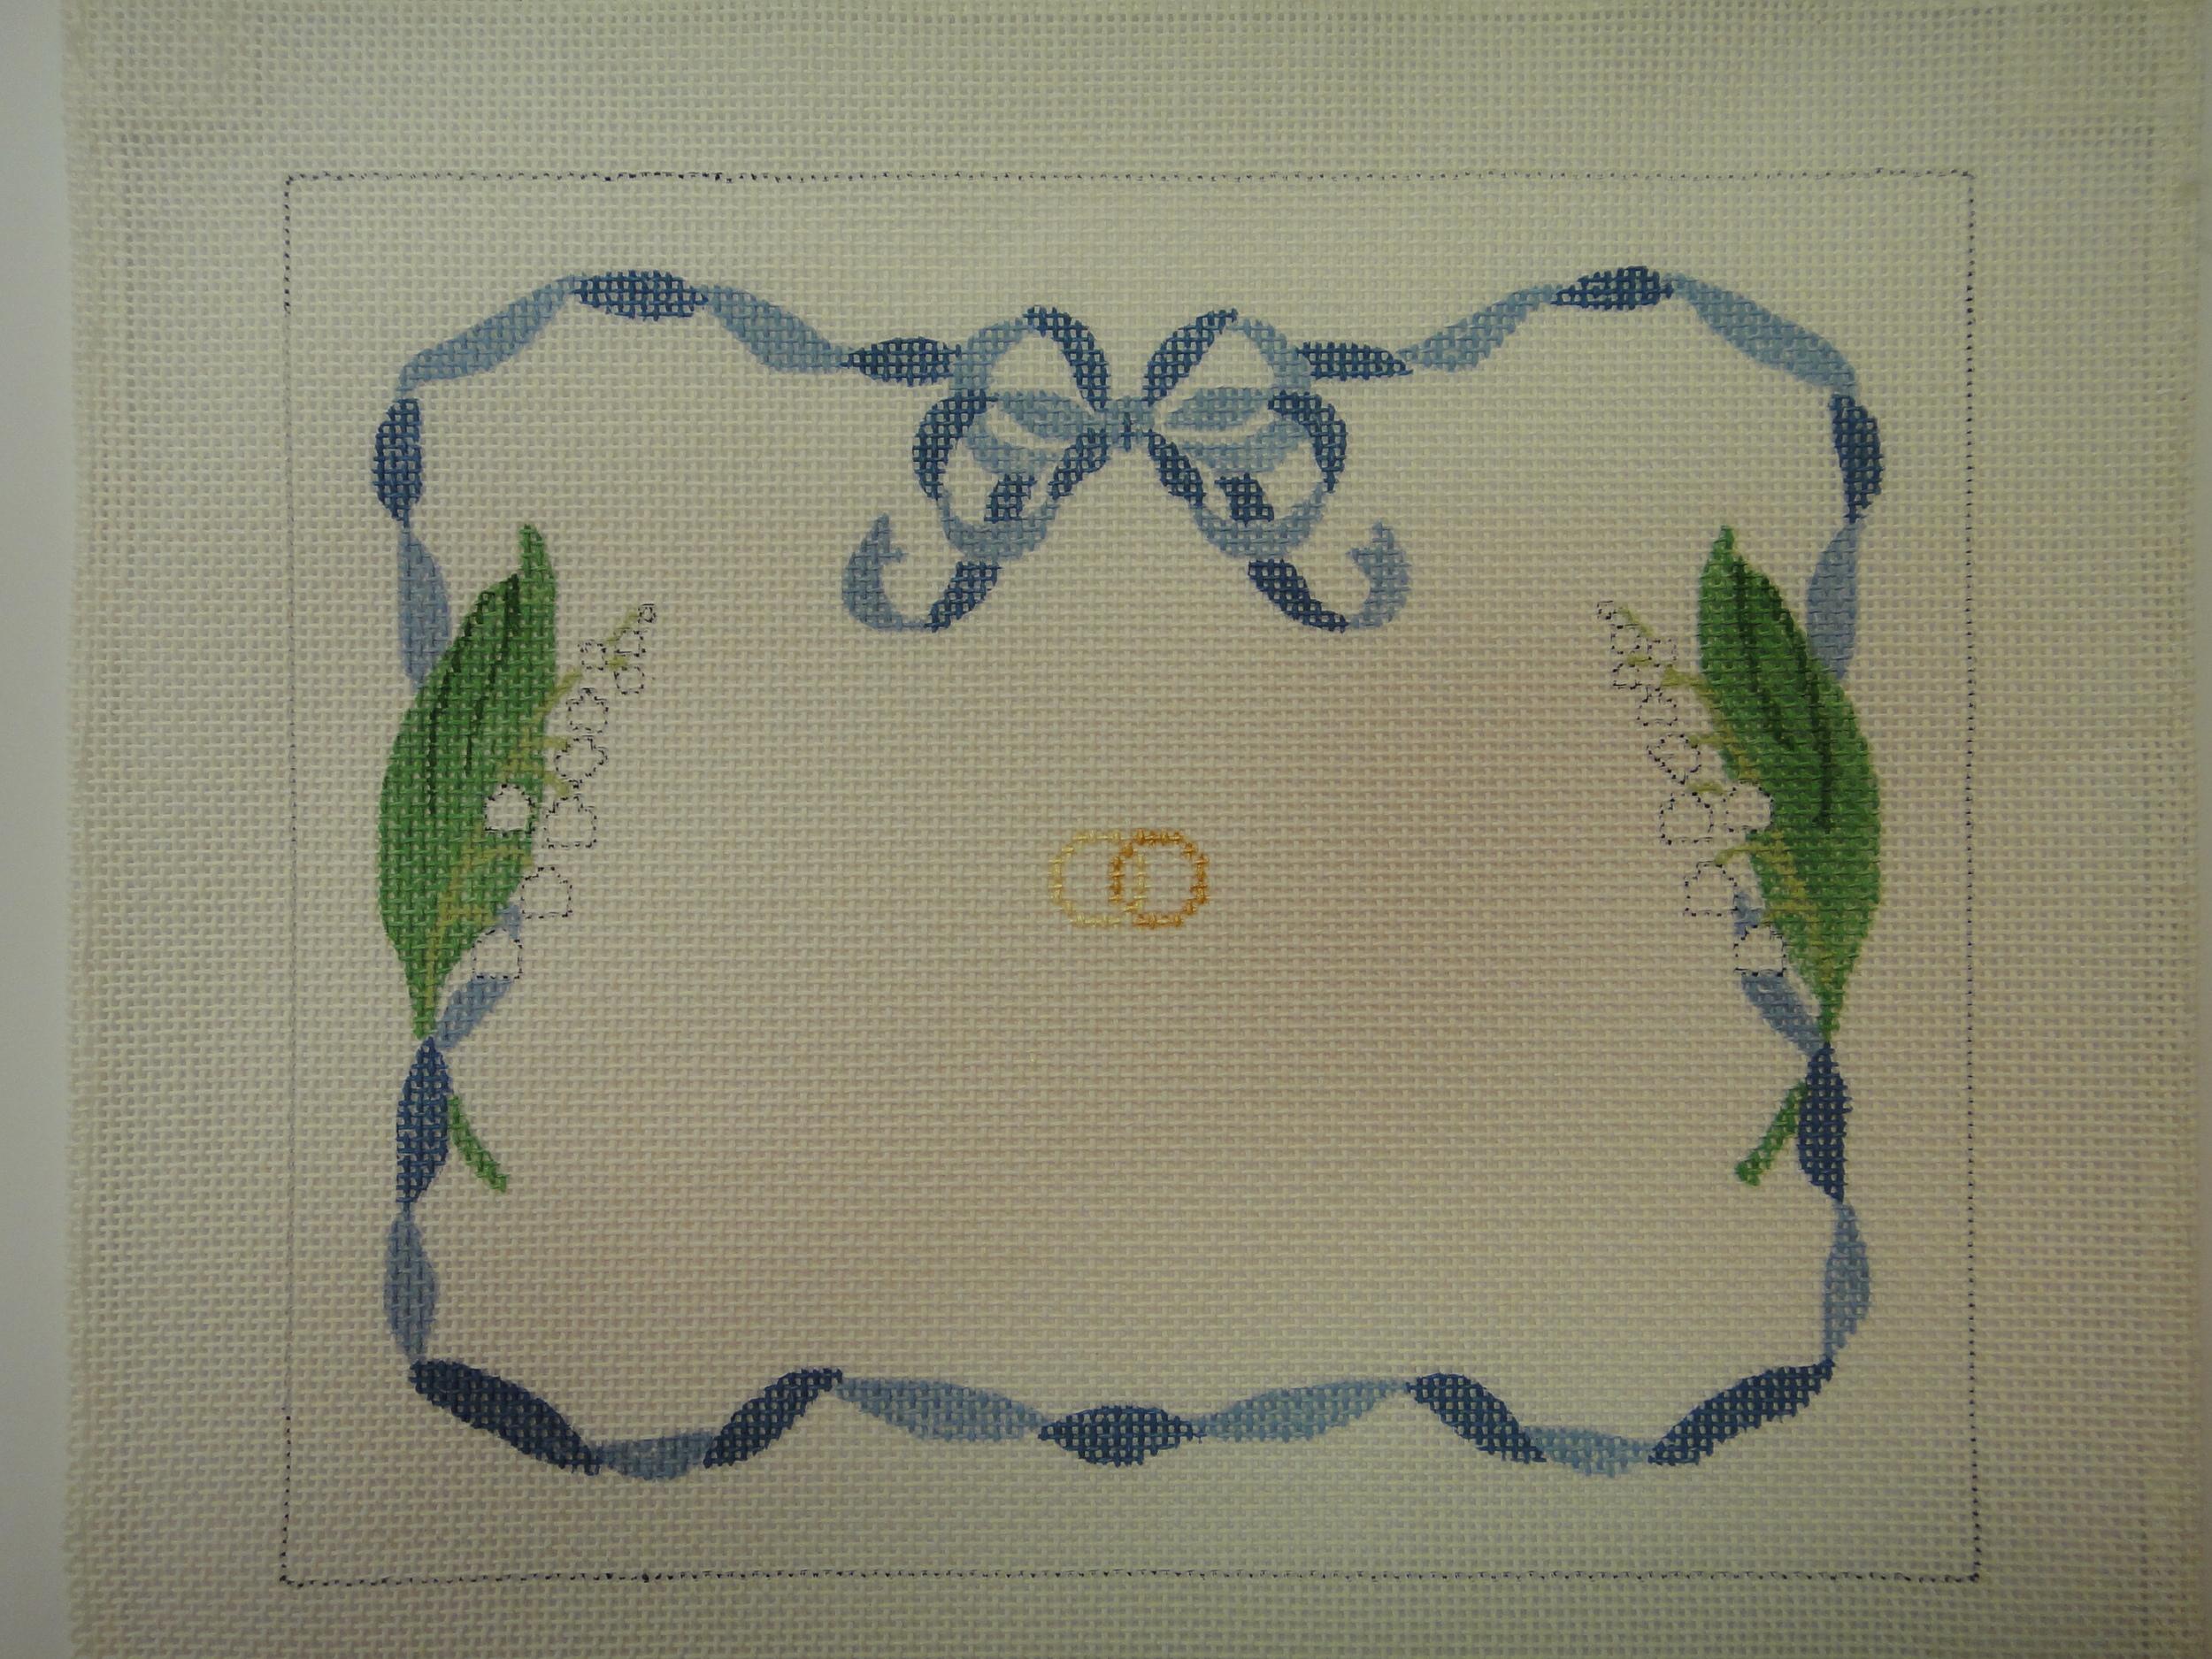 S10 Wedding Ring Sampler, 13 or 18 mesh (8x6)